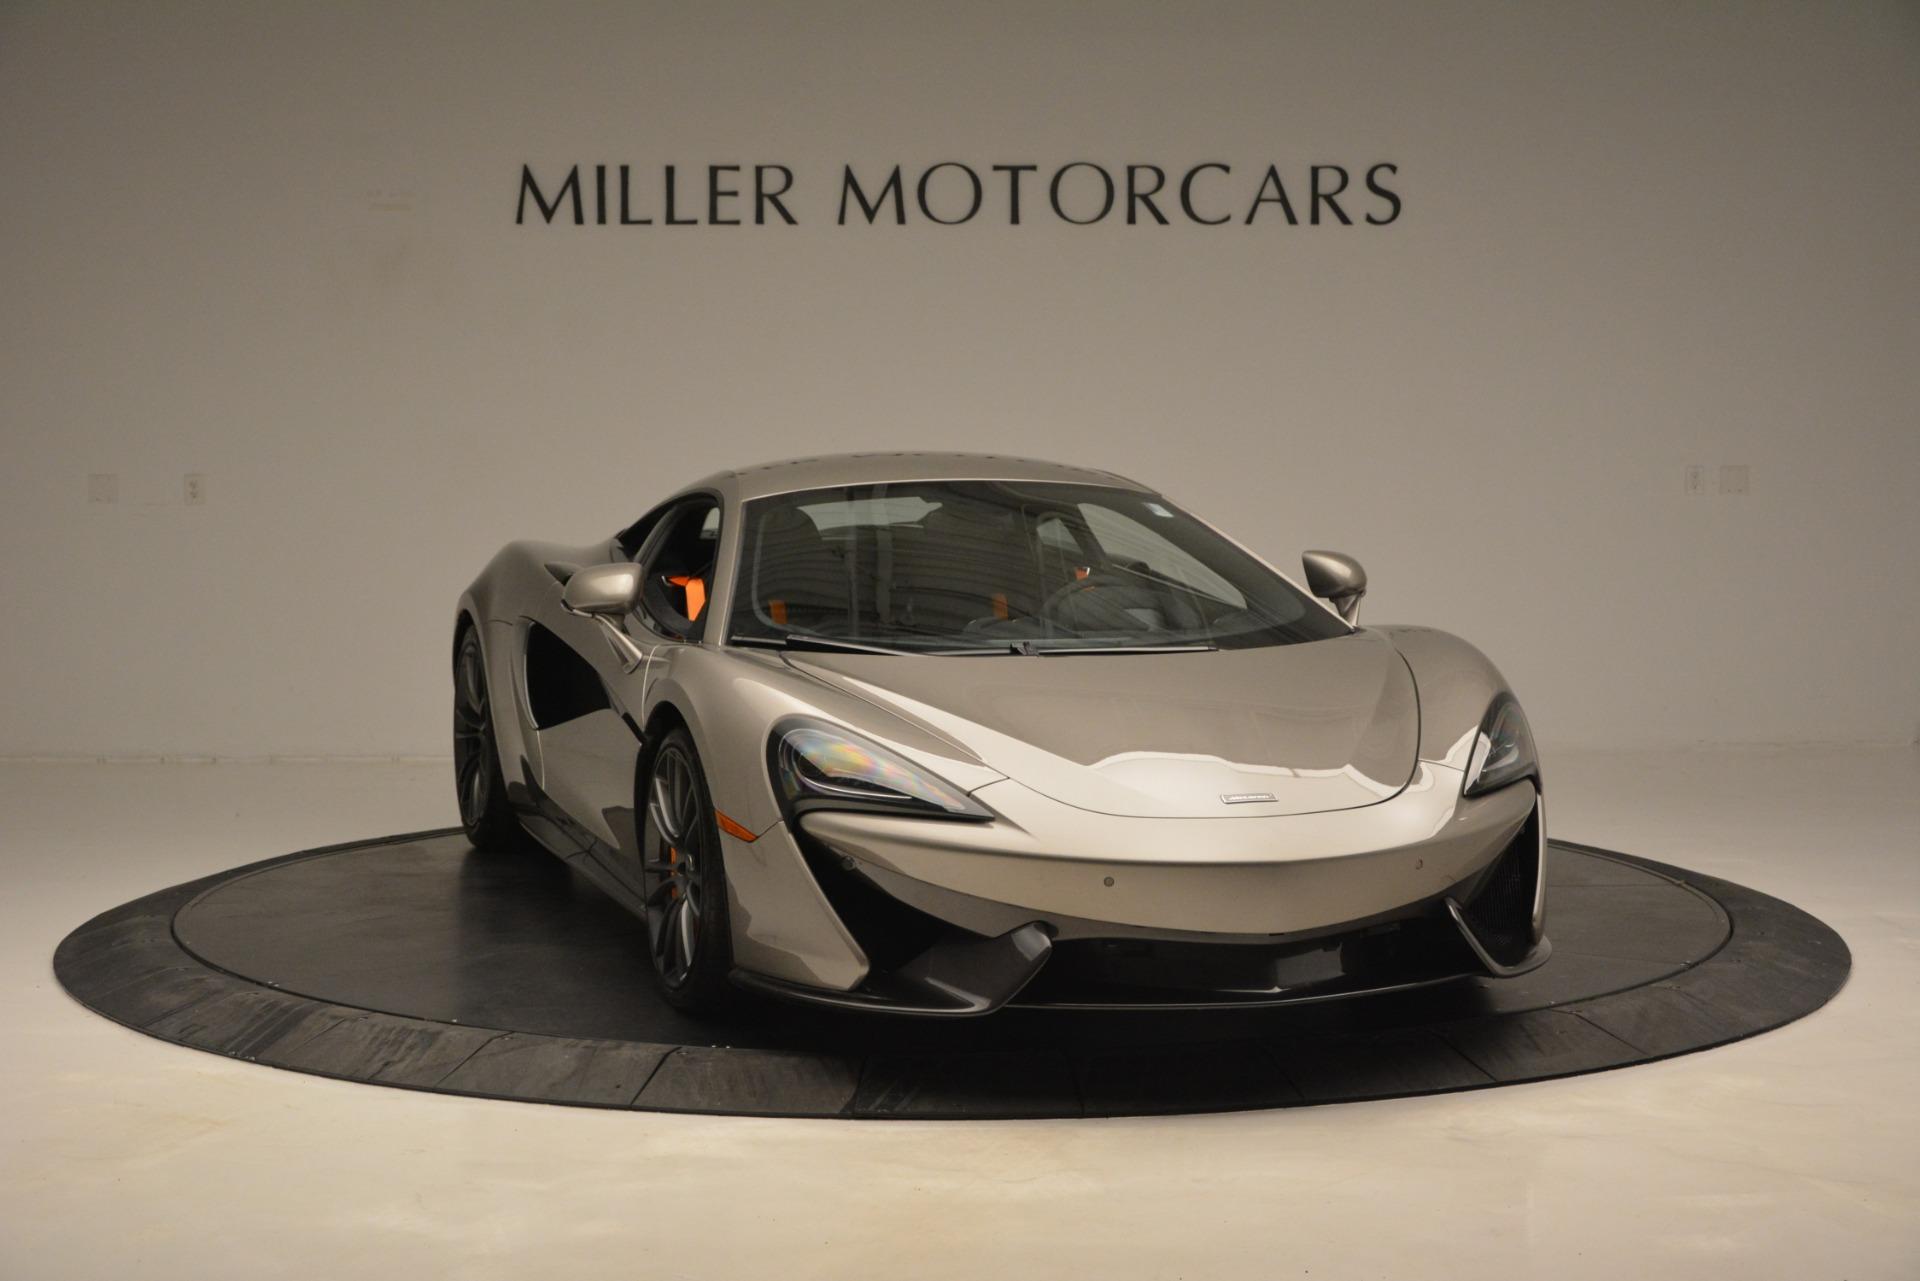 Used 2017 McLaren 570S Coupe For Sale In Westport, CT 2842_p11